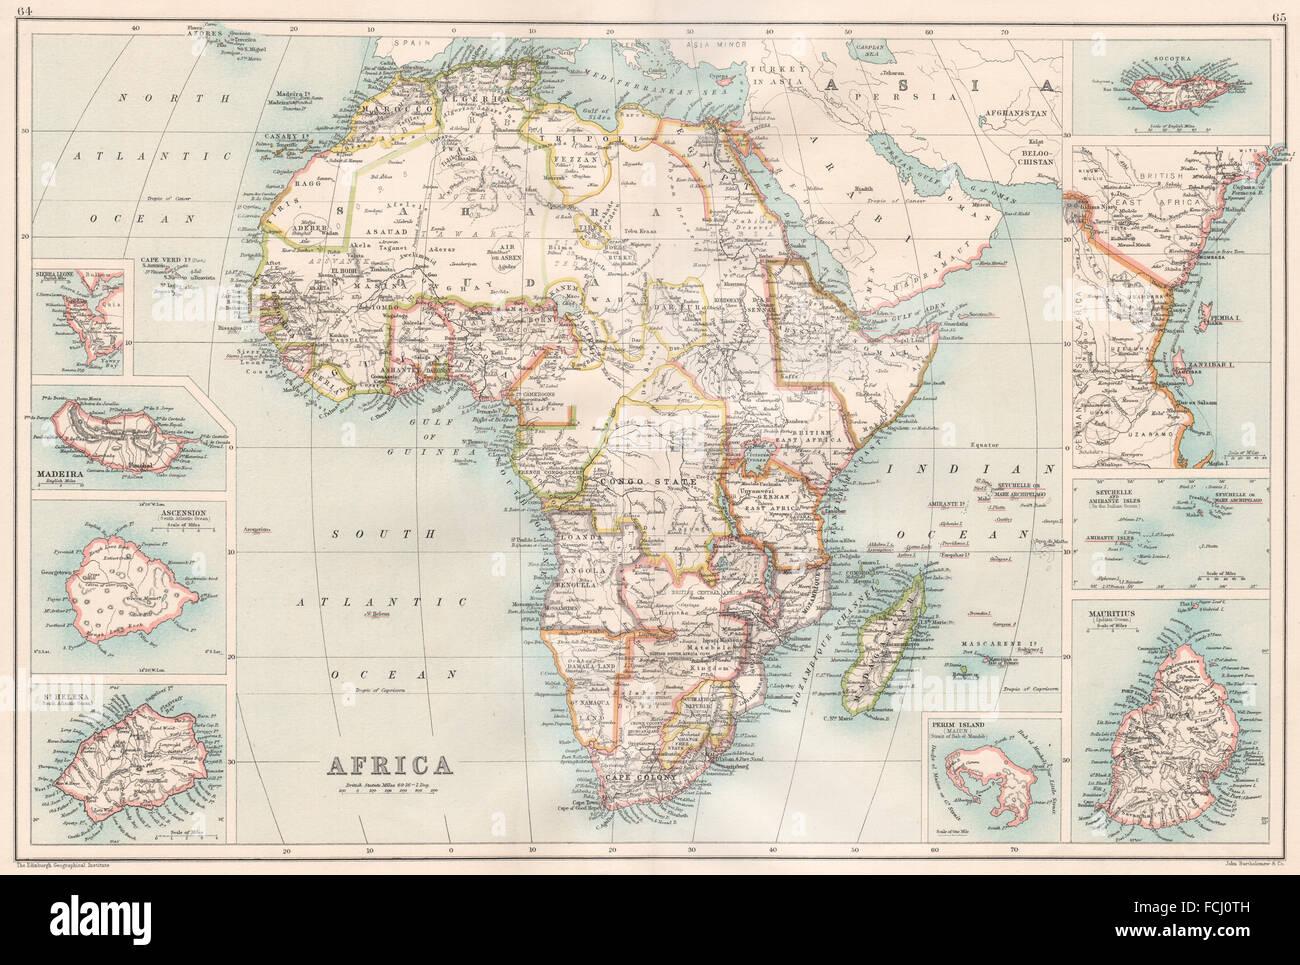 Seychellen Karte Afrika.Afrika Inseln Madeira St Helena Socotra Sansibar Seychellen